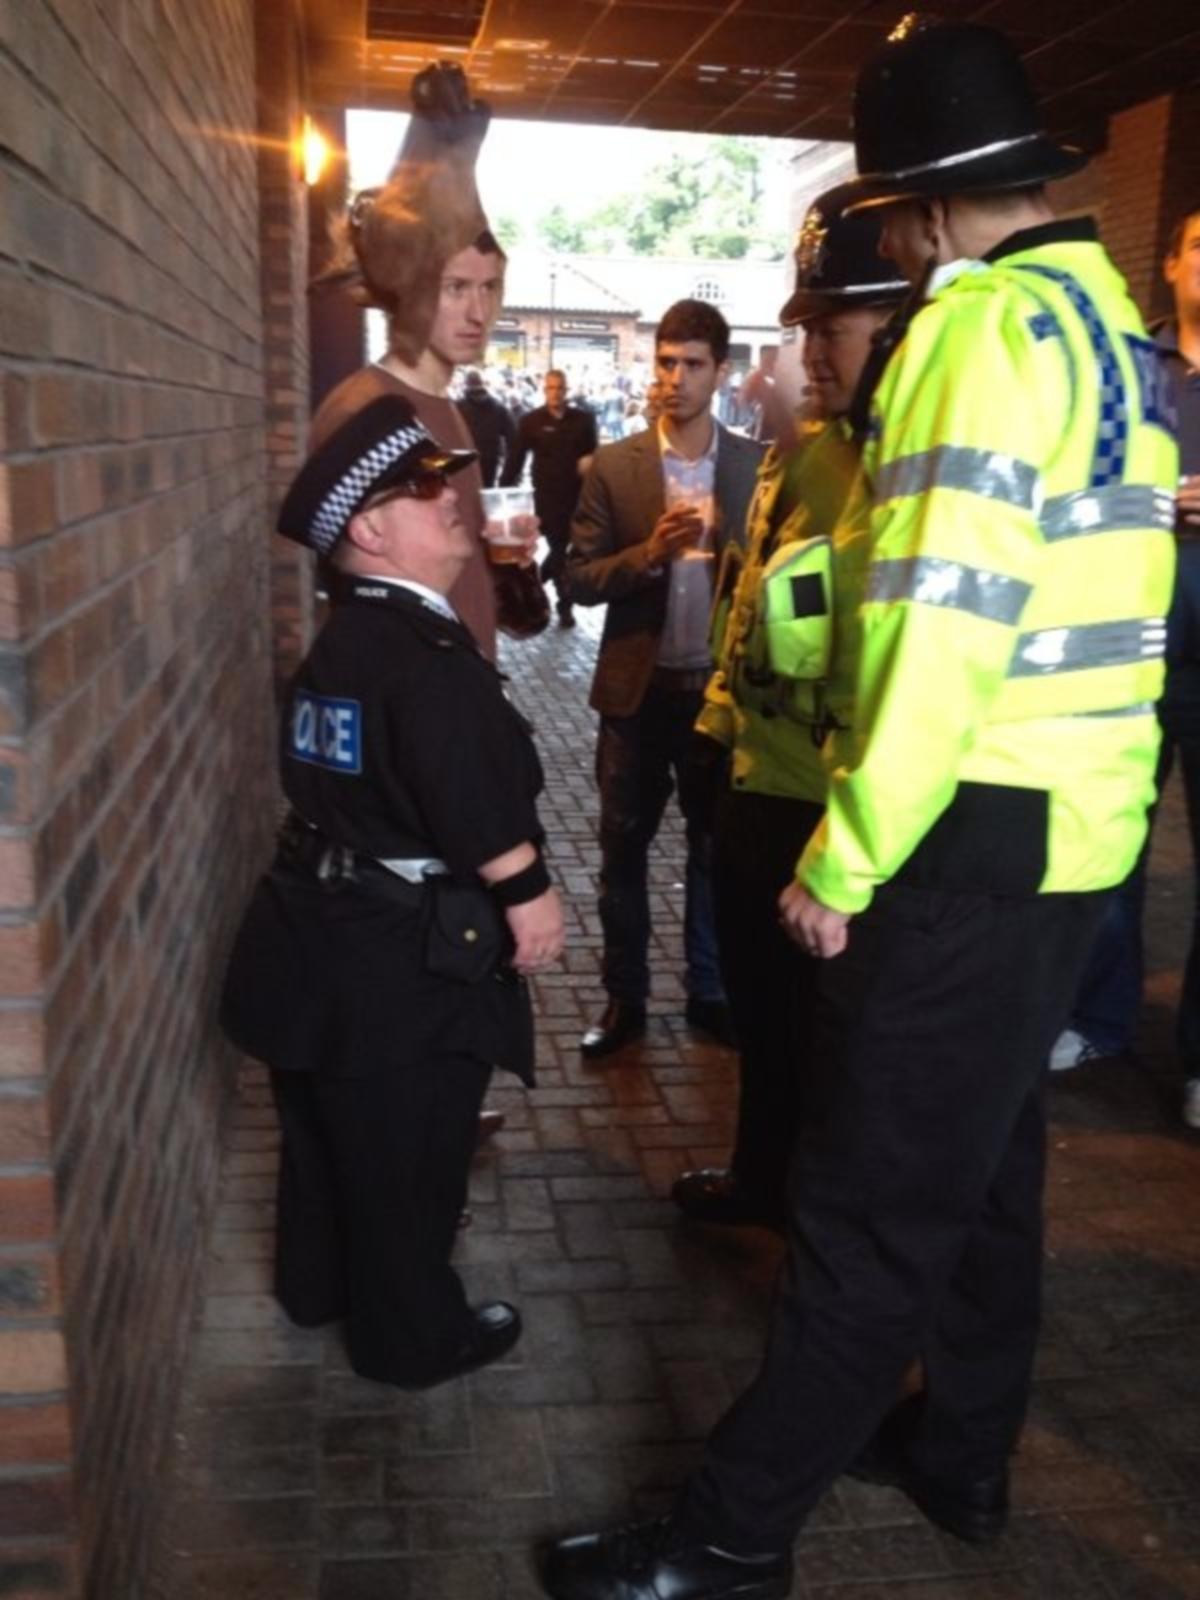 Midget getting arrest